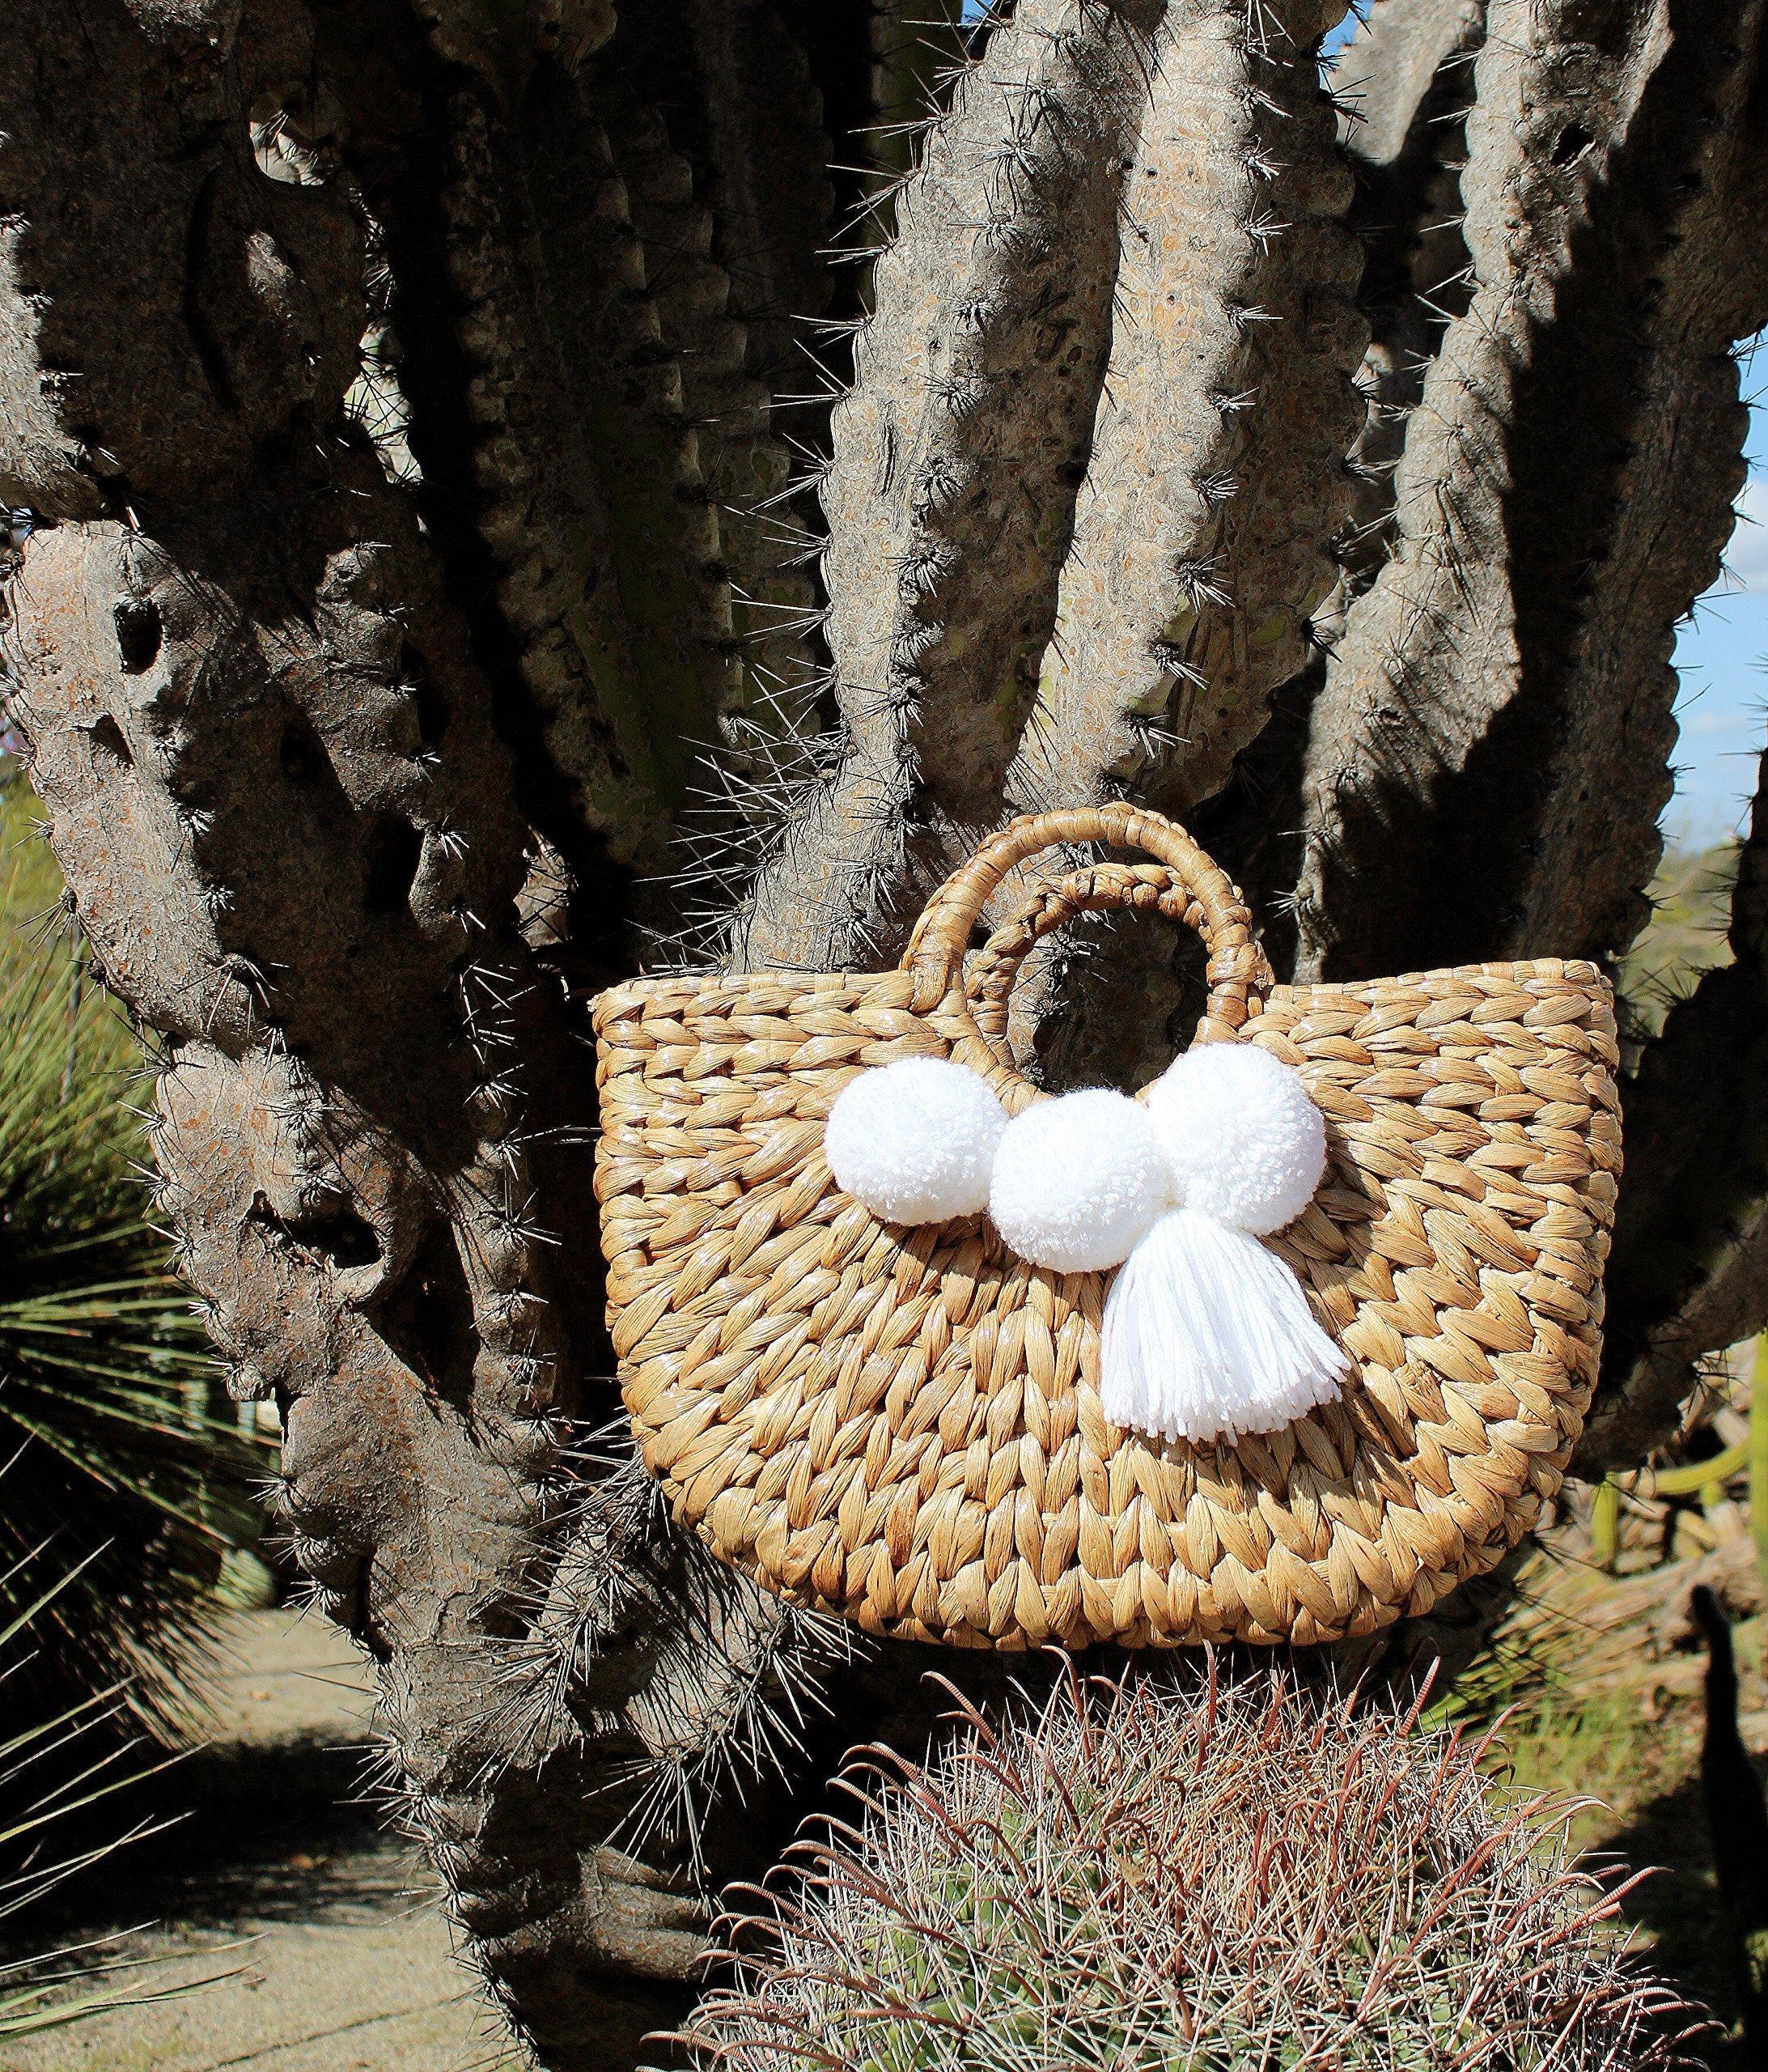 """Brunna Beach Bag"" Water Hyacinth bag, in White / Picnic Bag / Boho Chic Bag / Shabby Chic Bag / Woven Bag / Pompom Beach Bag - handmade-bags"